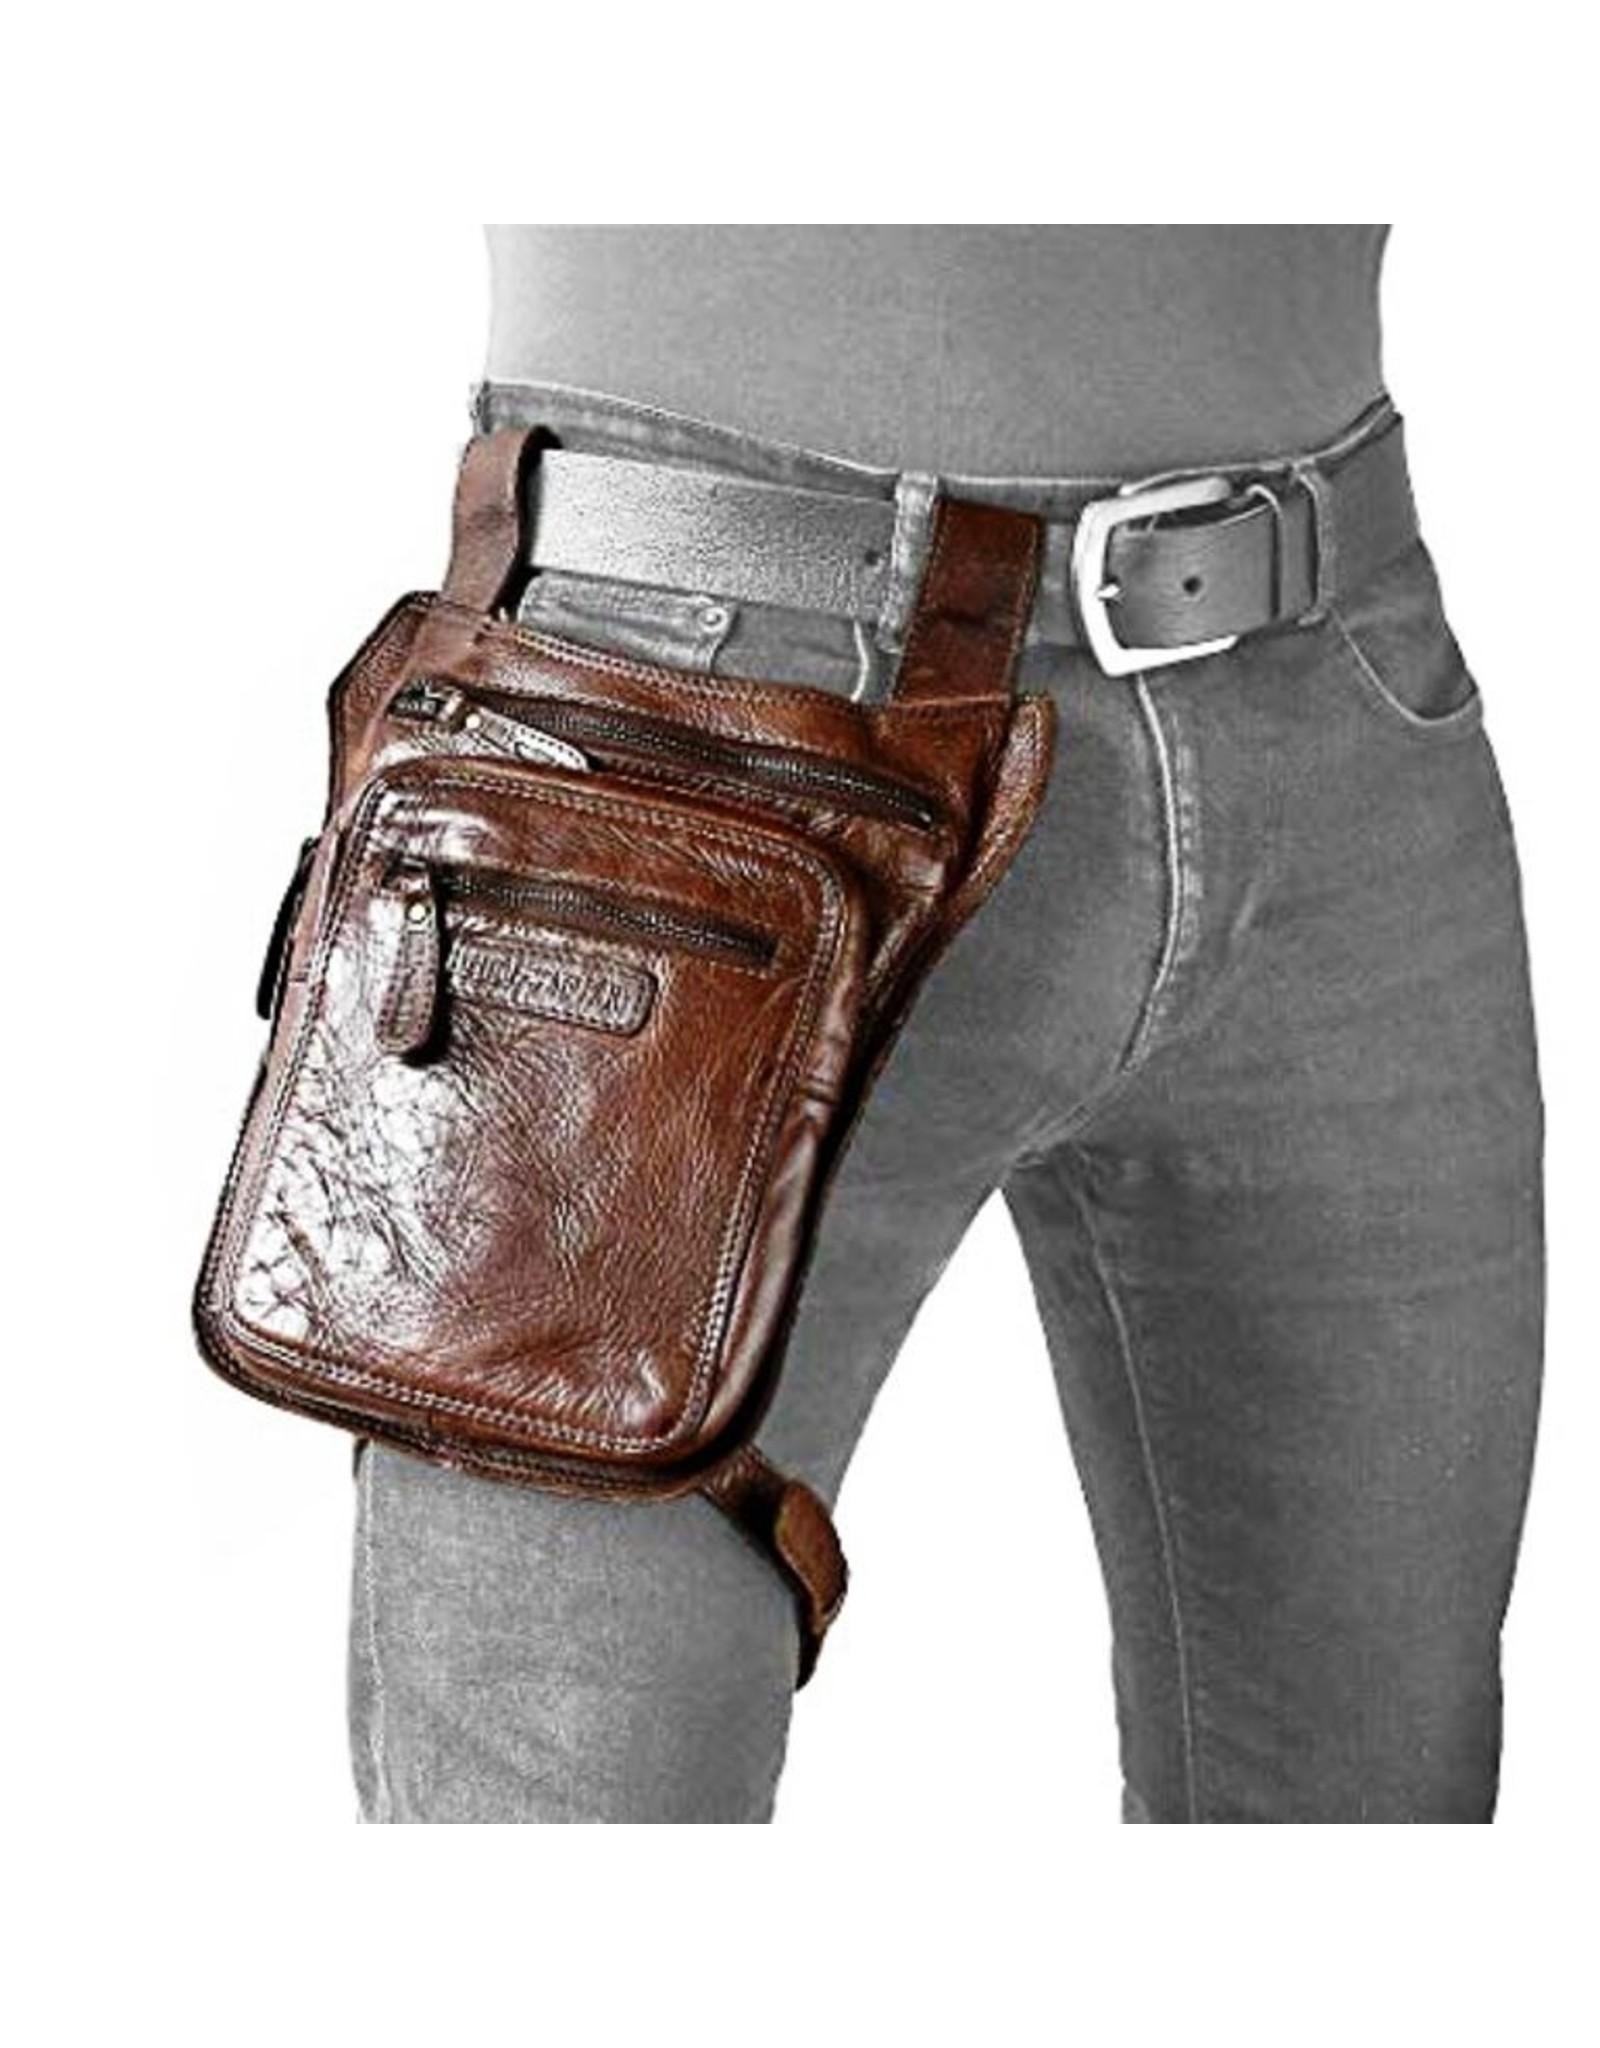 HillBurry Leather bags - HillBurry belt bag  leg bag washed leather brown